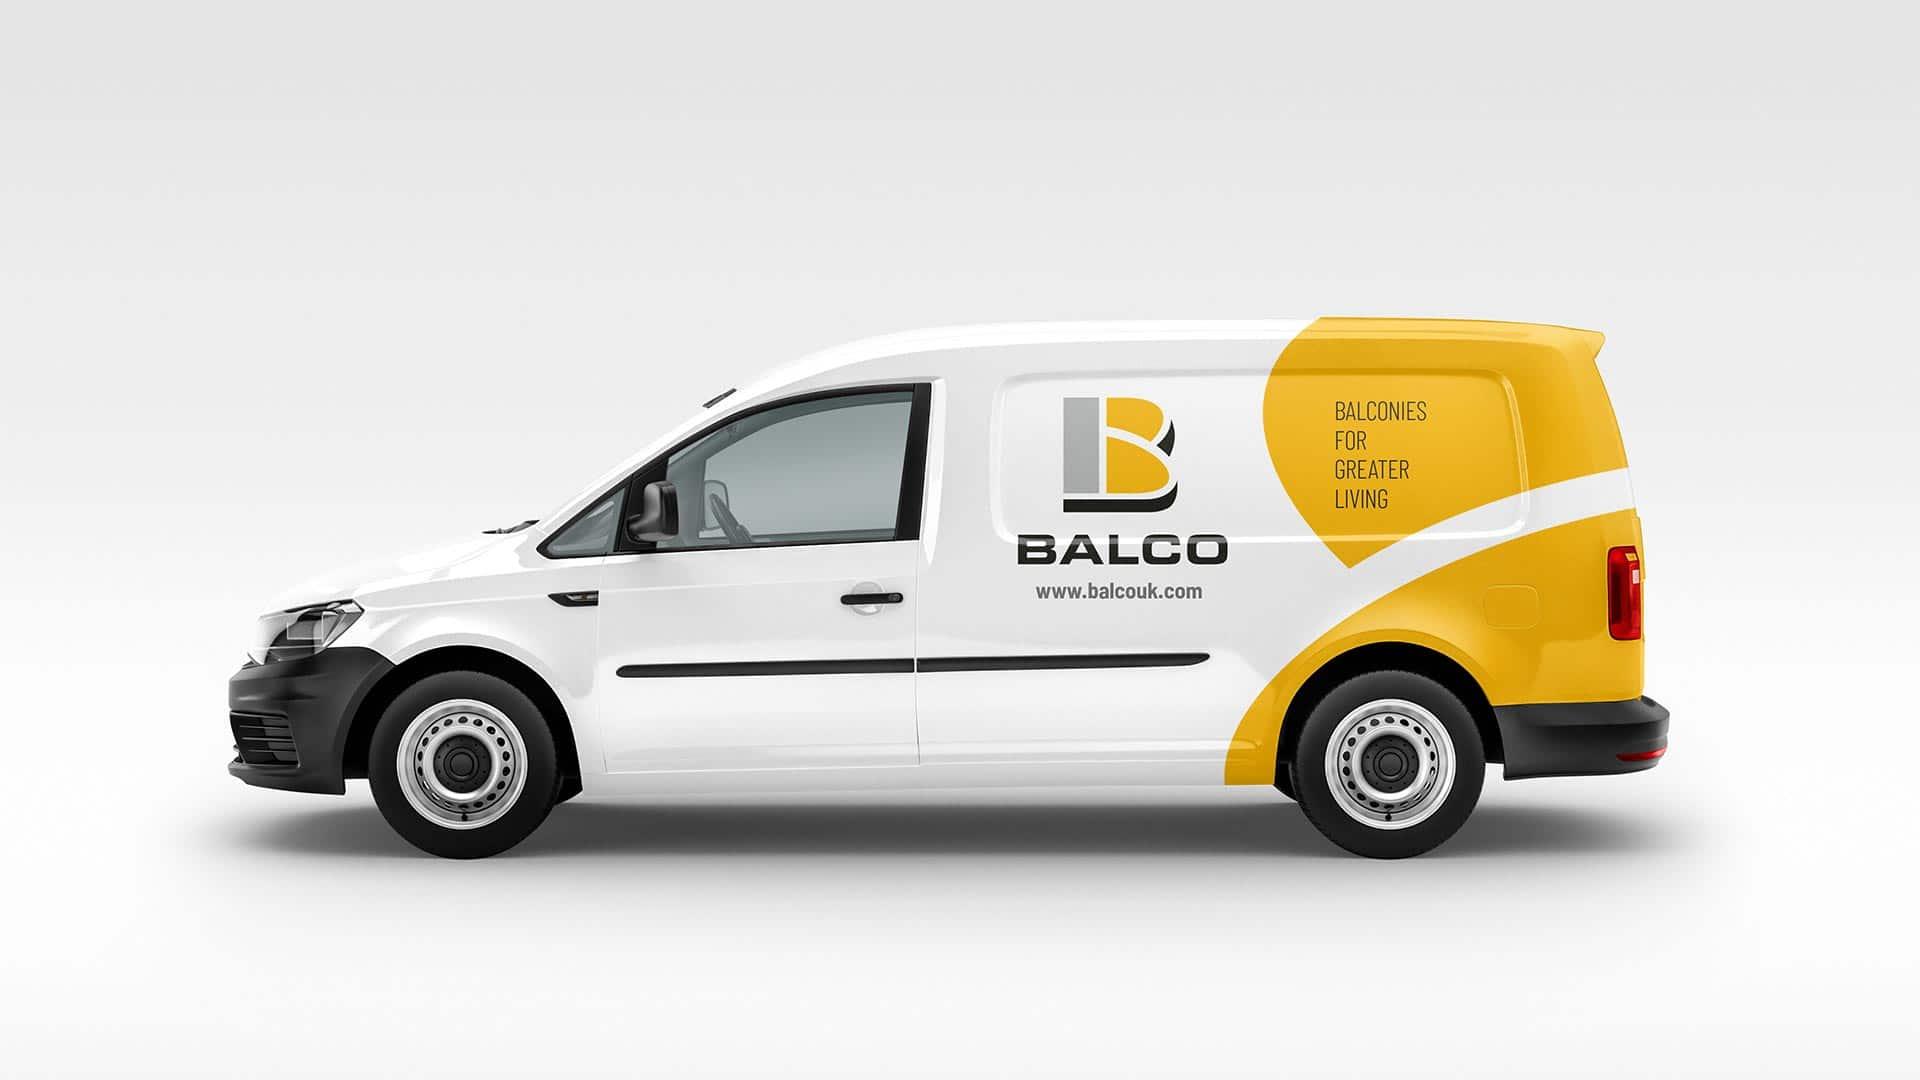 Balco - design bilmaskning